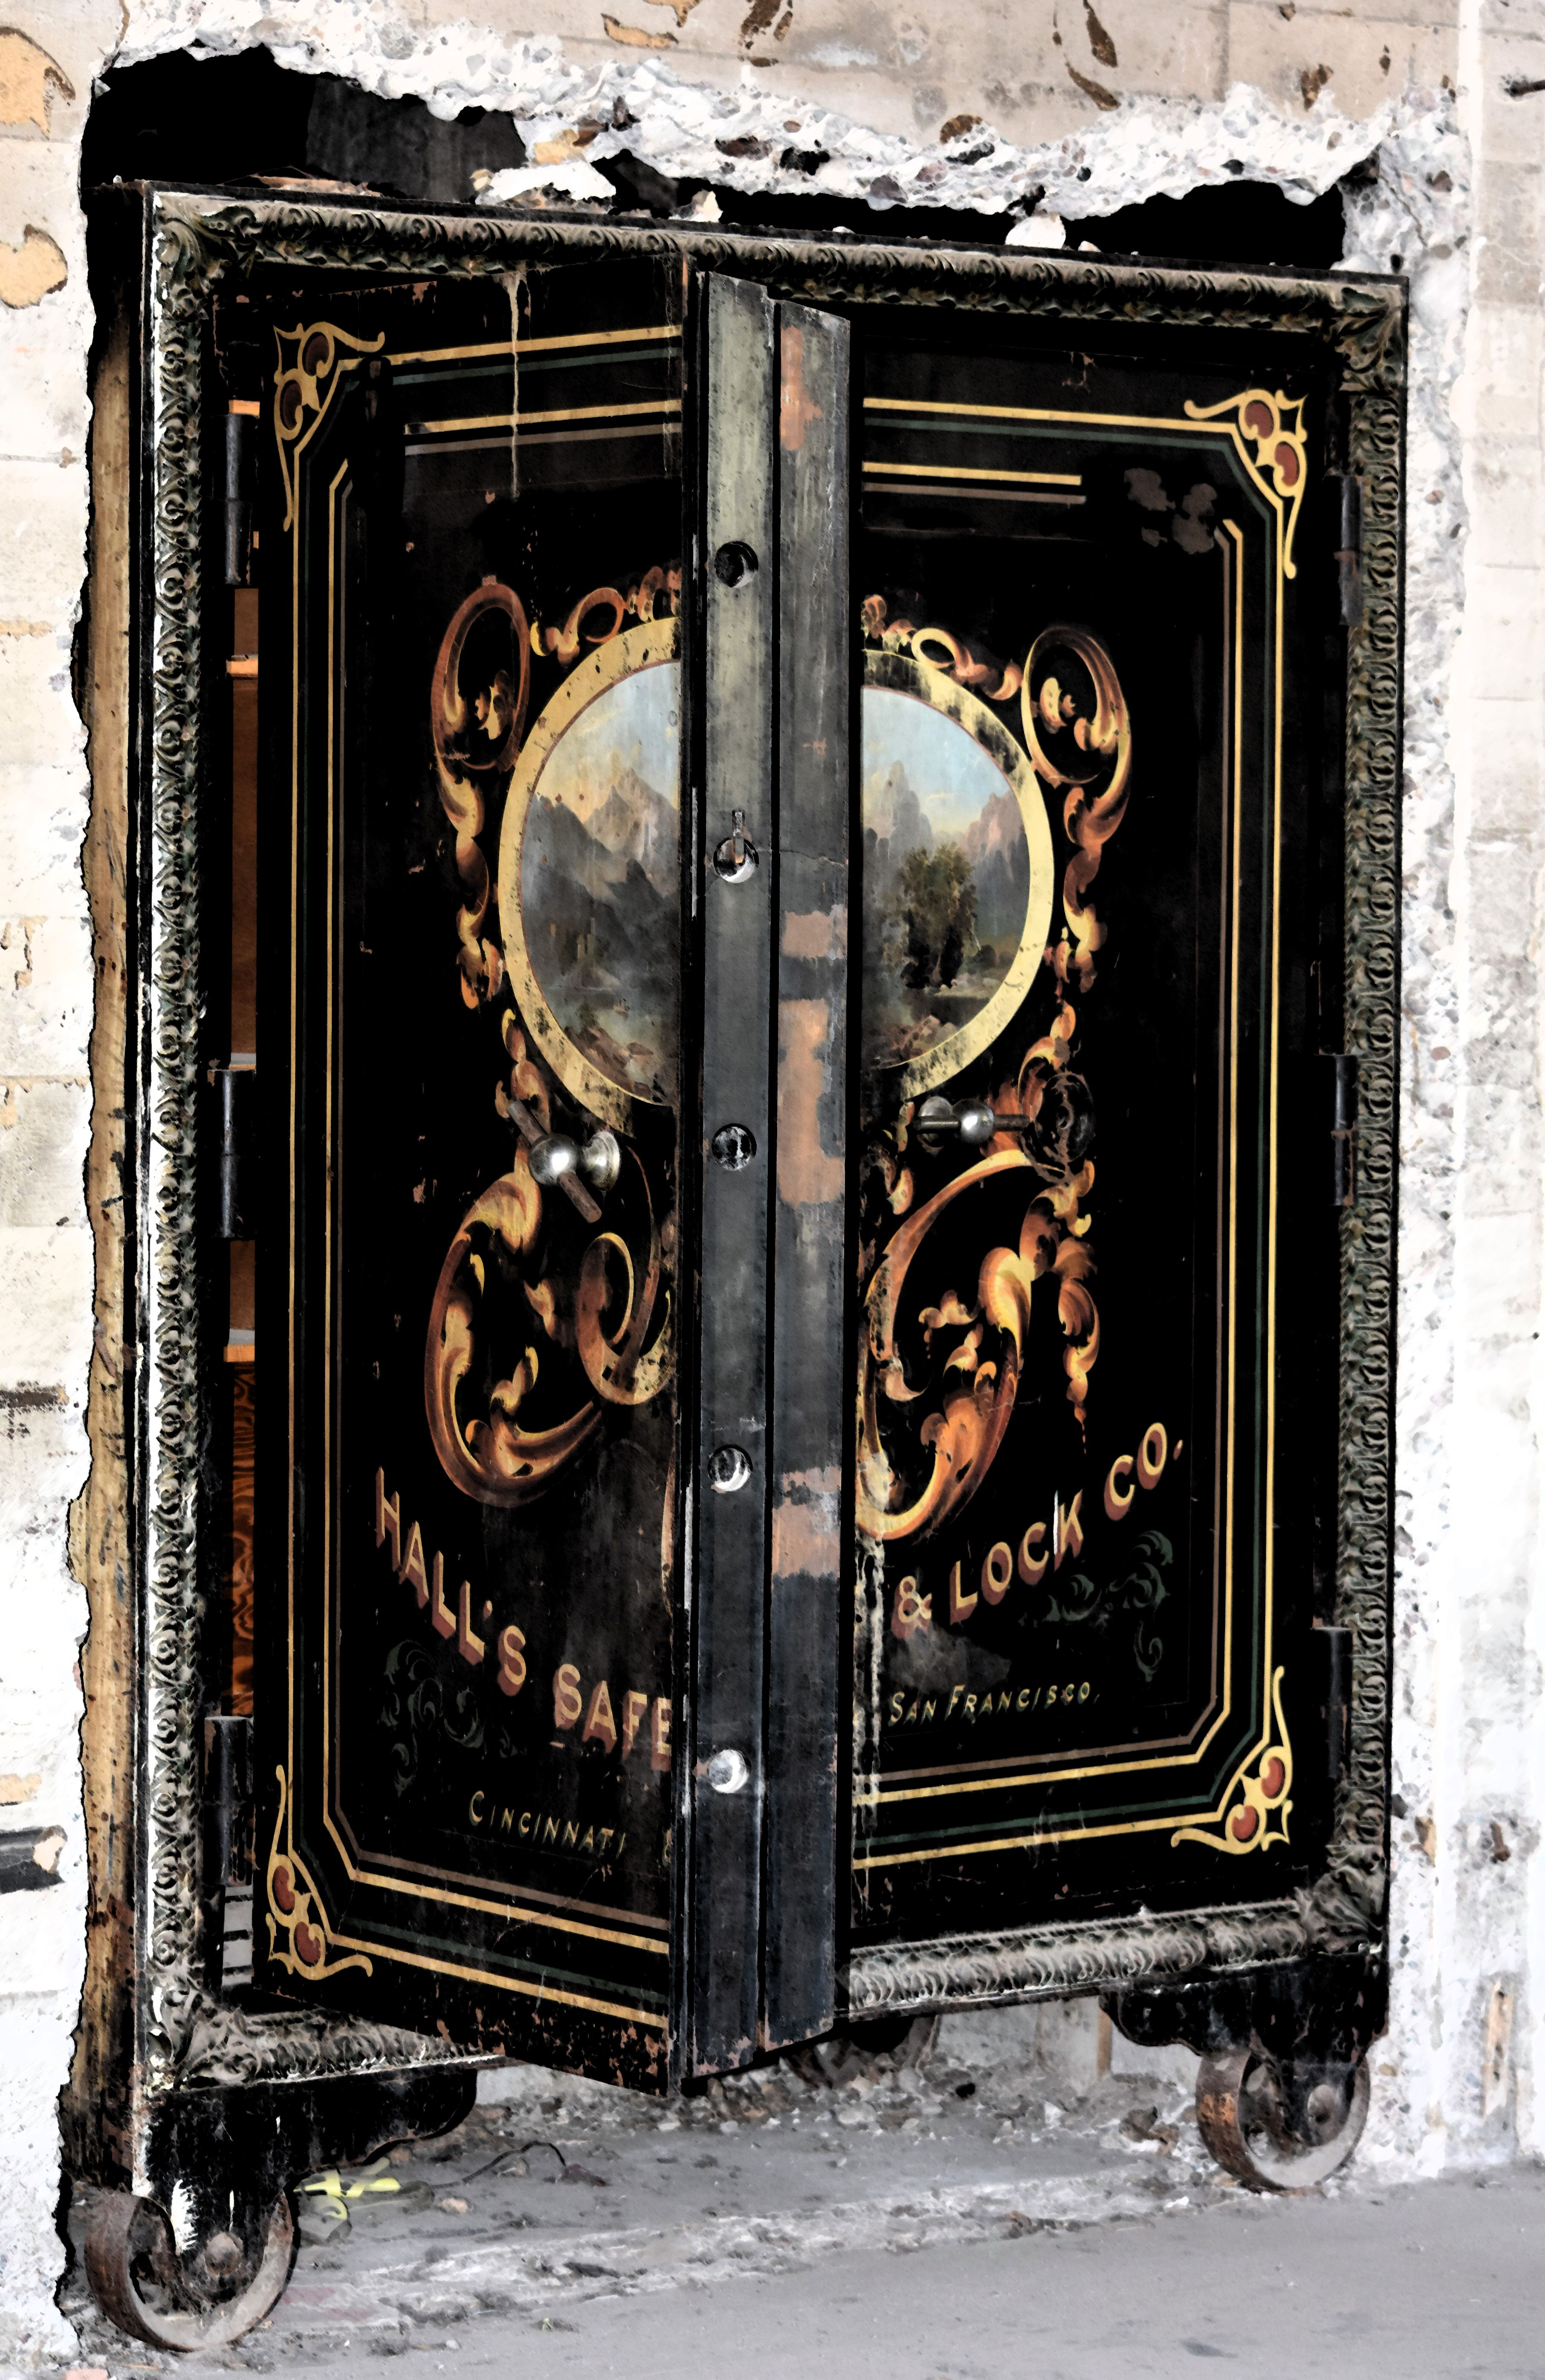 Antique Safe Hall S Safe Amp Lock Company At The Hayden